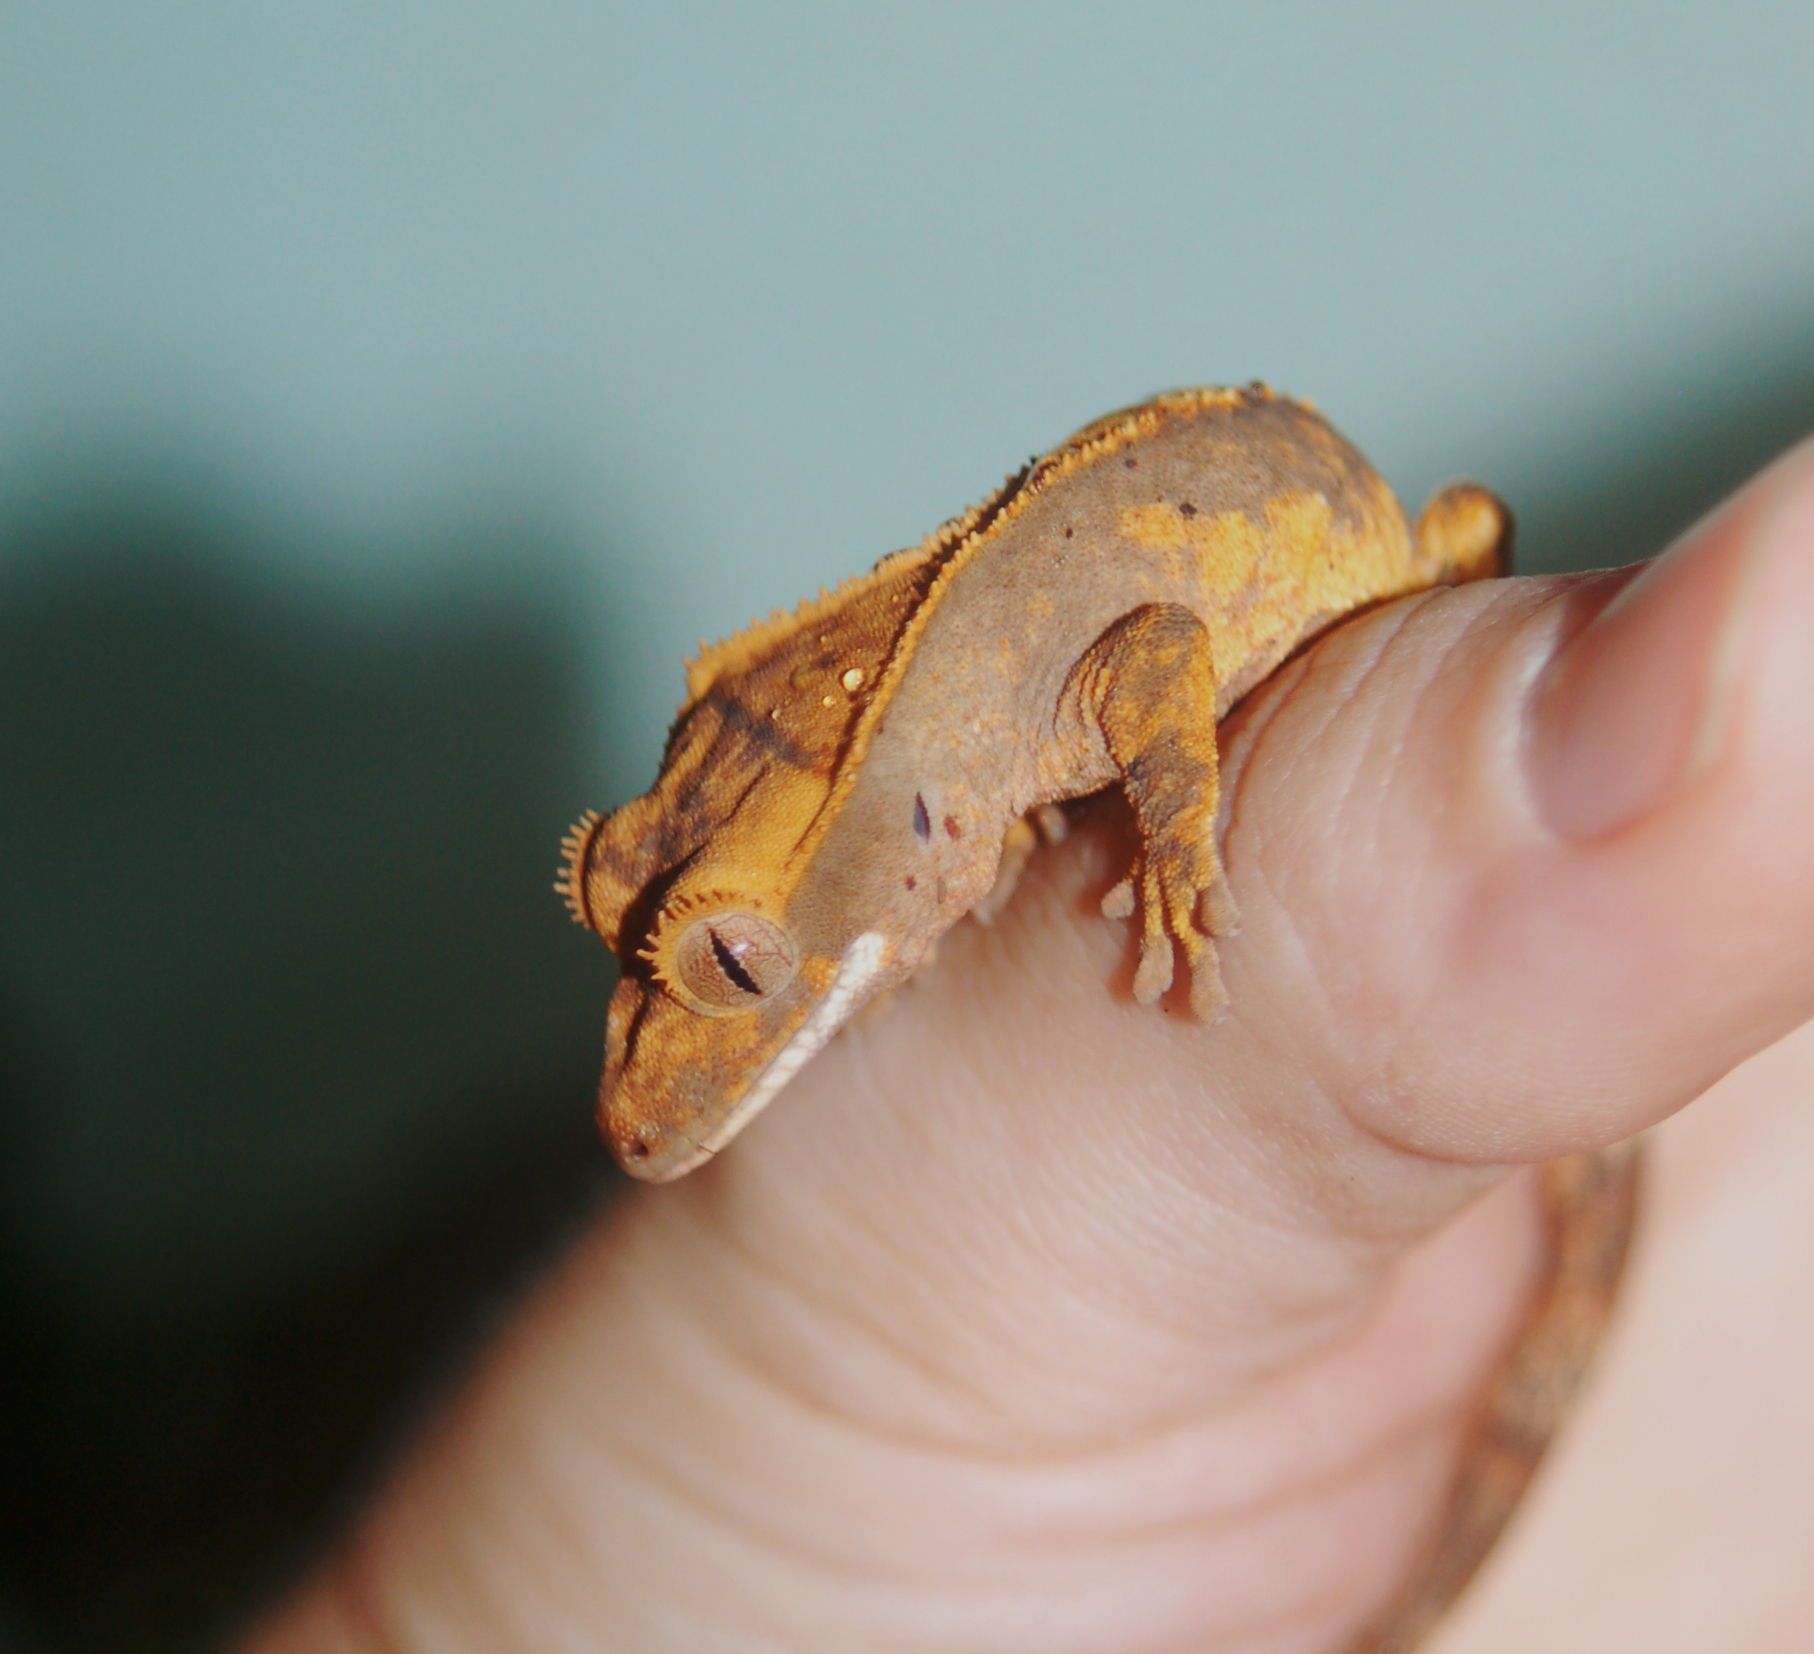 CrestedGecko